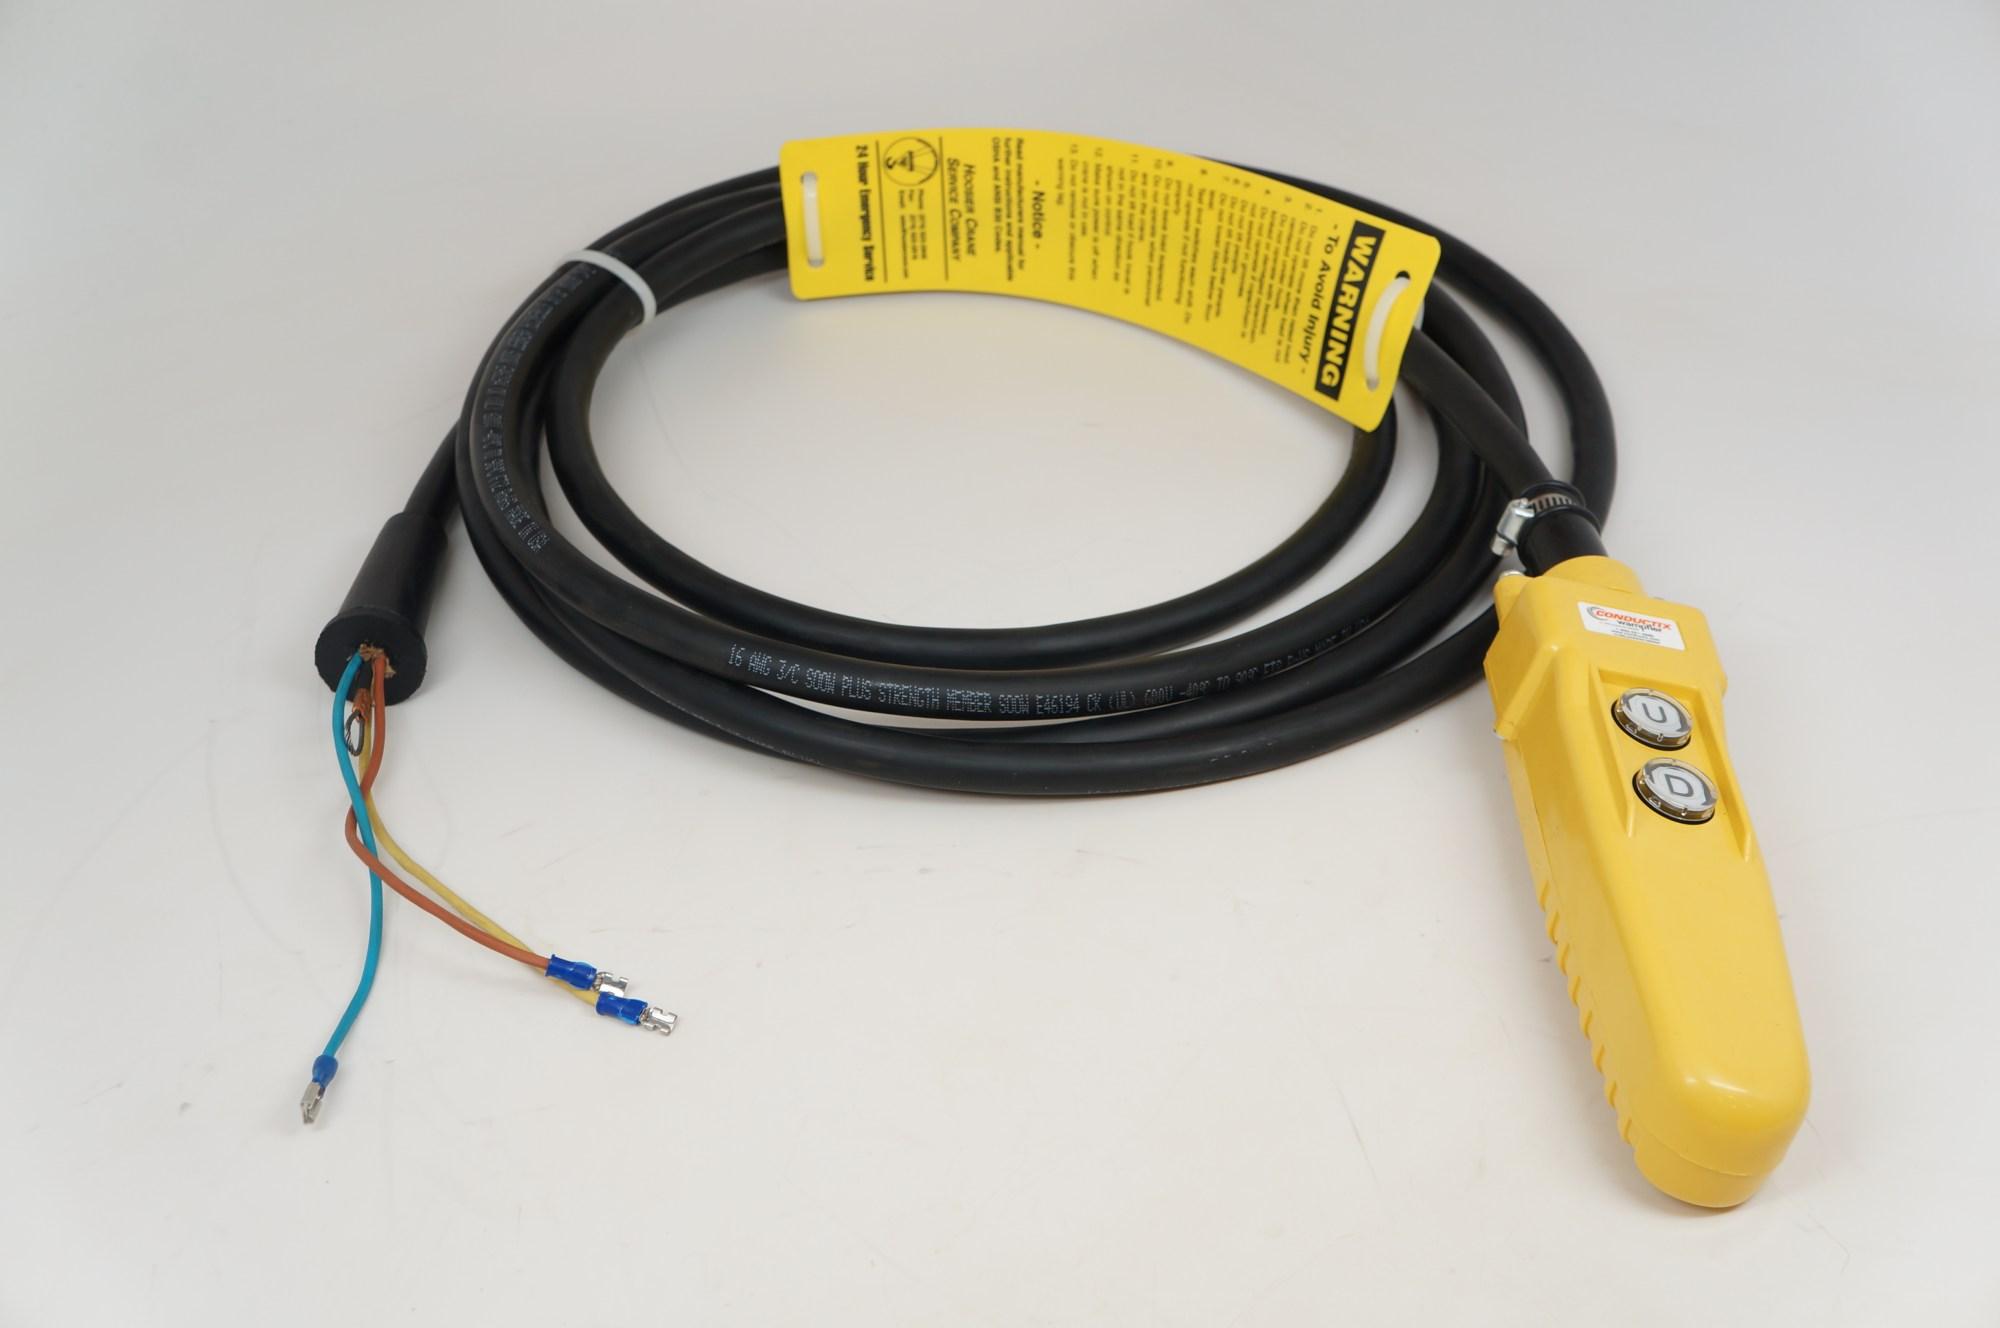 hight resolution of pendant control station for cm chain hoist 21 cord for lodestar valustar jib cranes jibcranes com 1 jib crane supplier